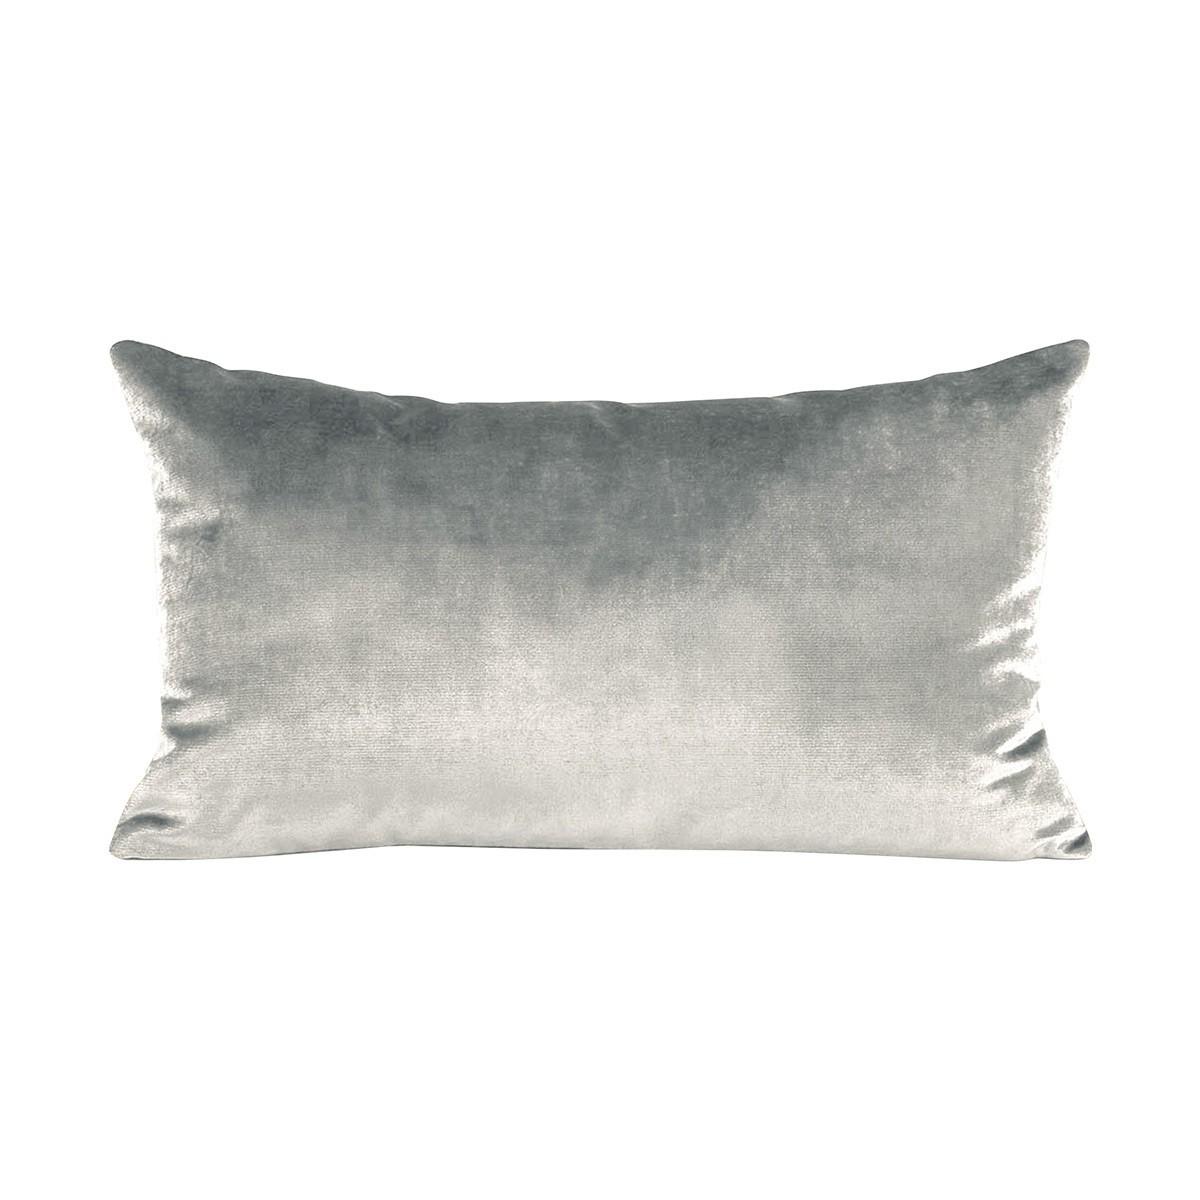 Cushion Cover Rectangular Berlingot